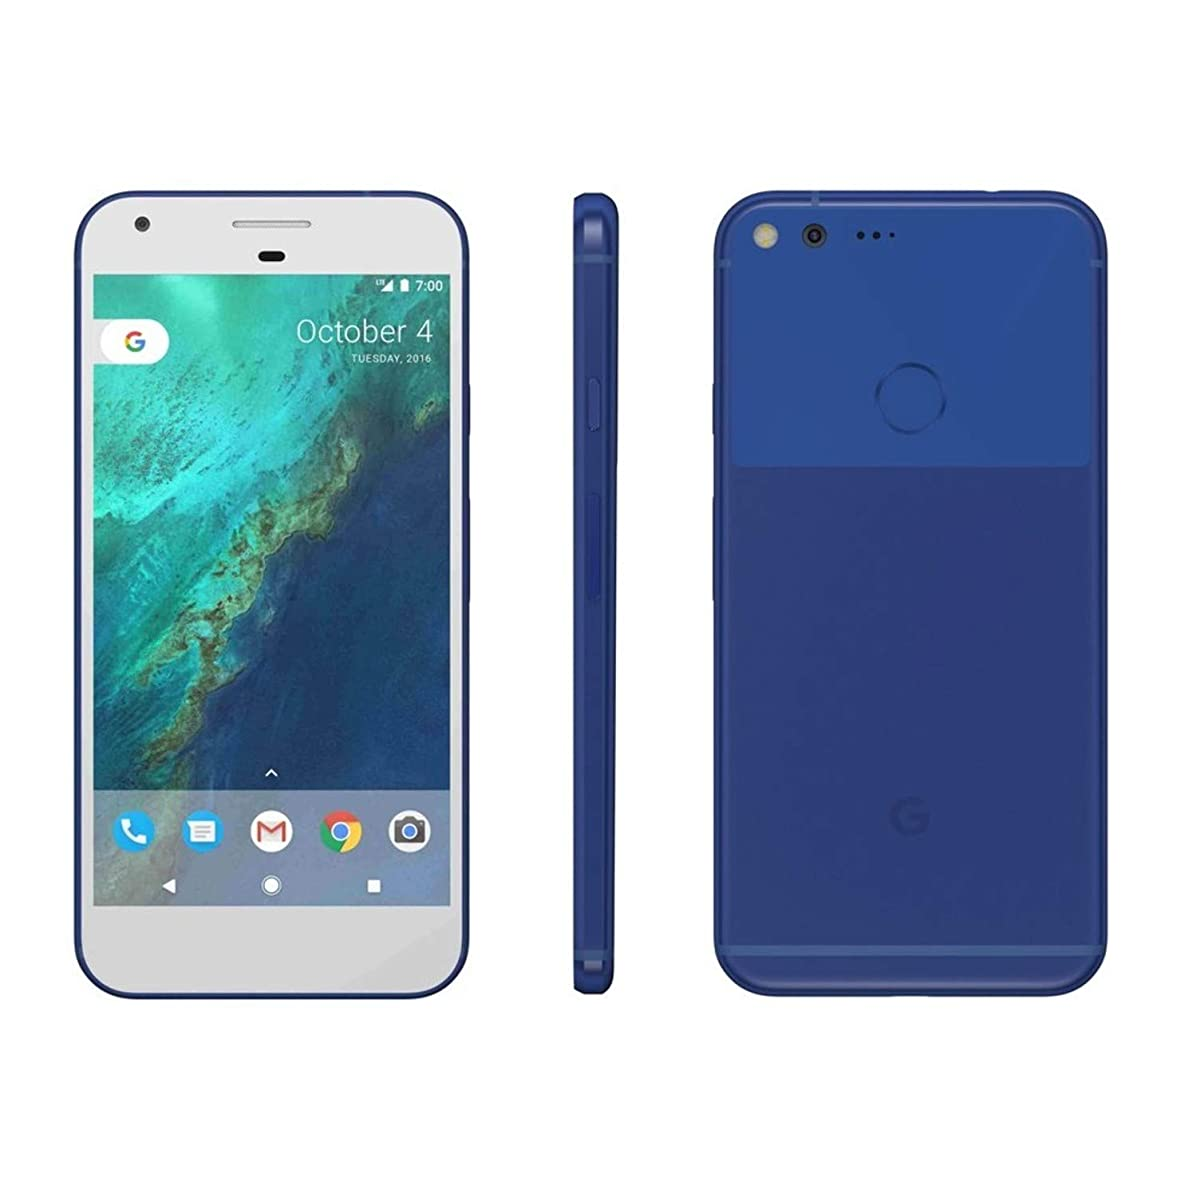 Google G-2PW2100-021-C Pixel XL 32GB Unlocked Phone, Really Blue, 5.5